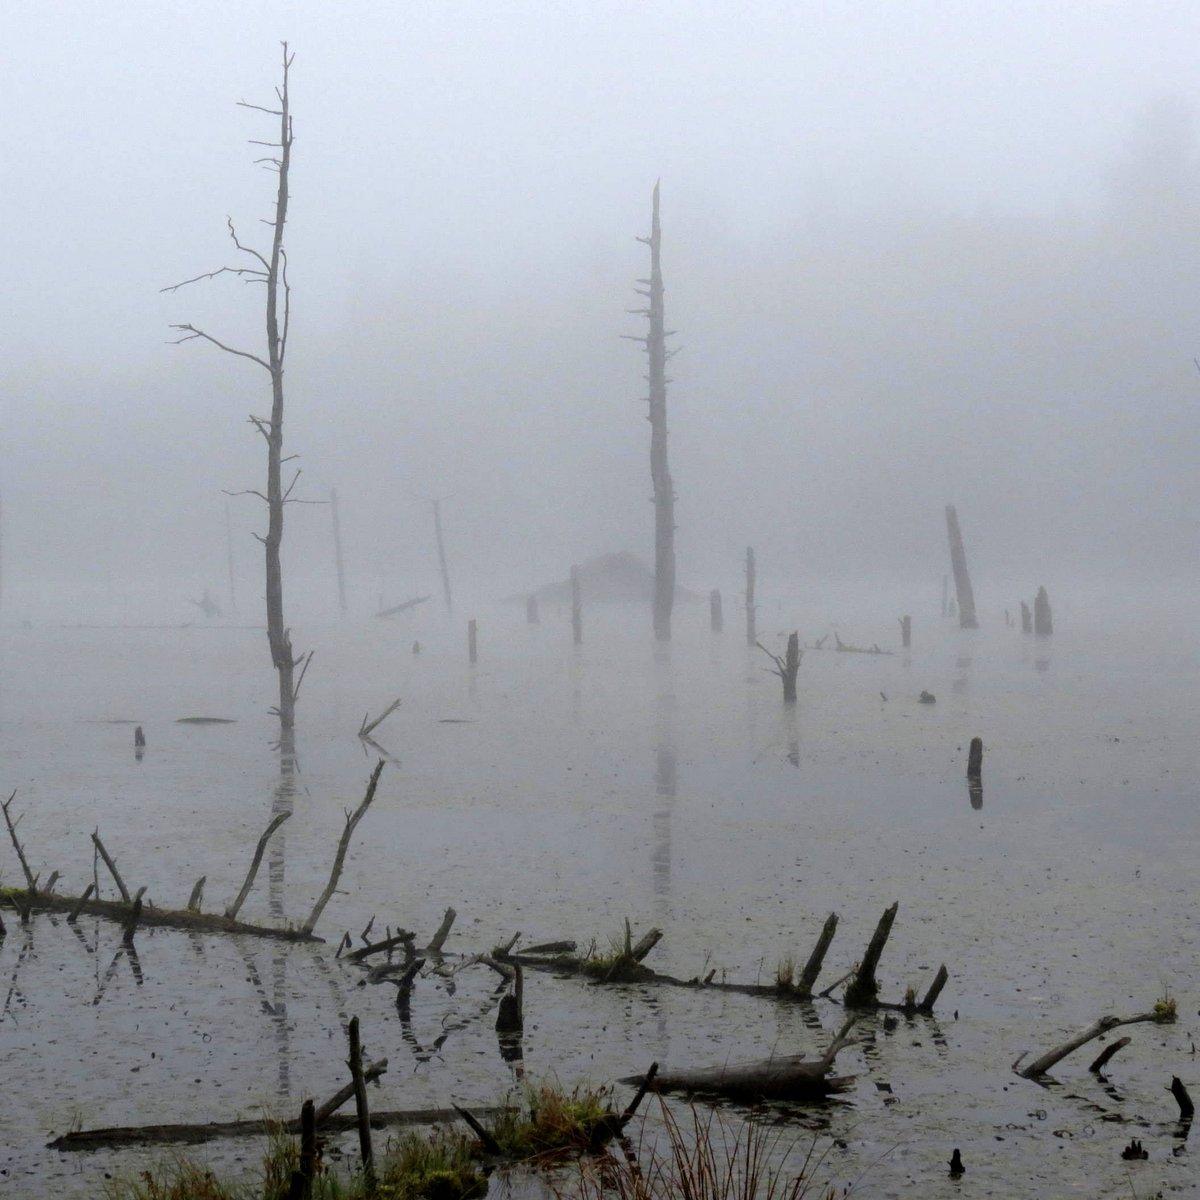 2. Beaver Lodge in Fog